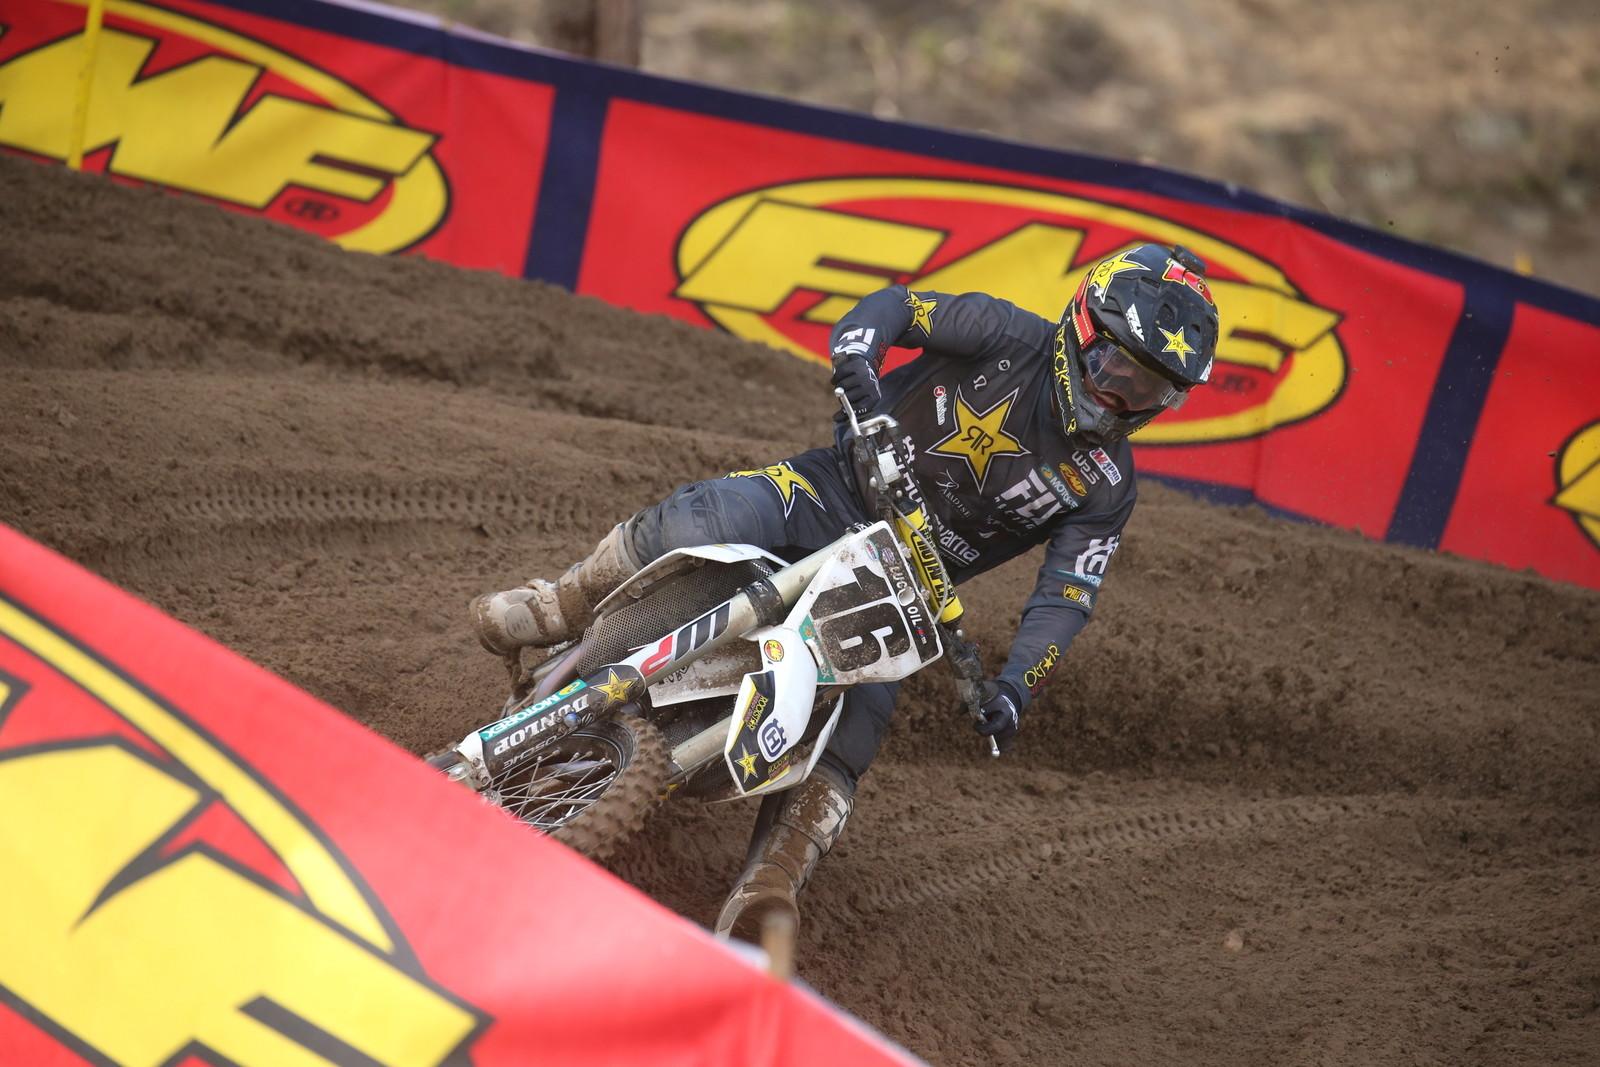 Zach Osborne Opts Out of Racing Supercross de Paris